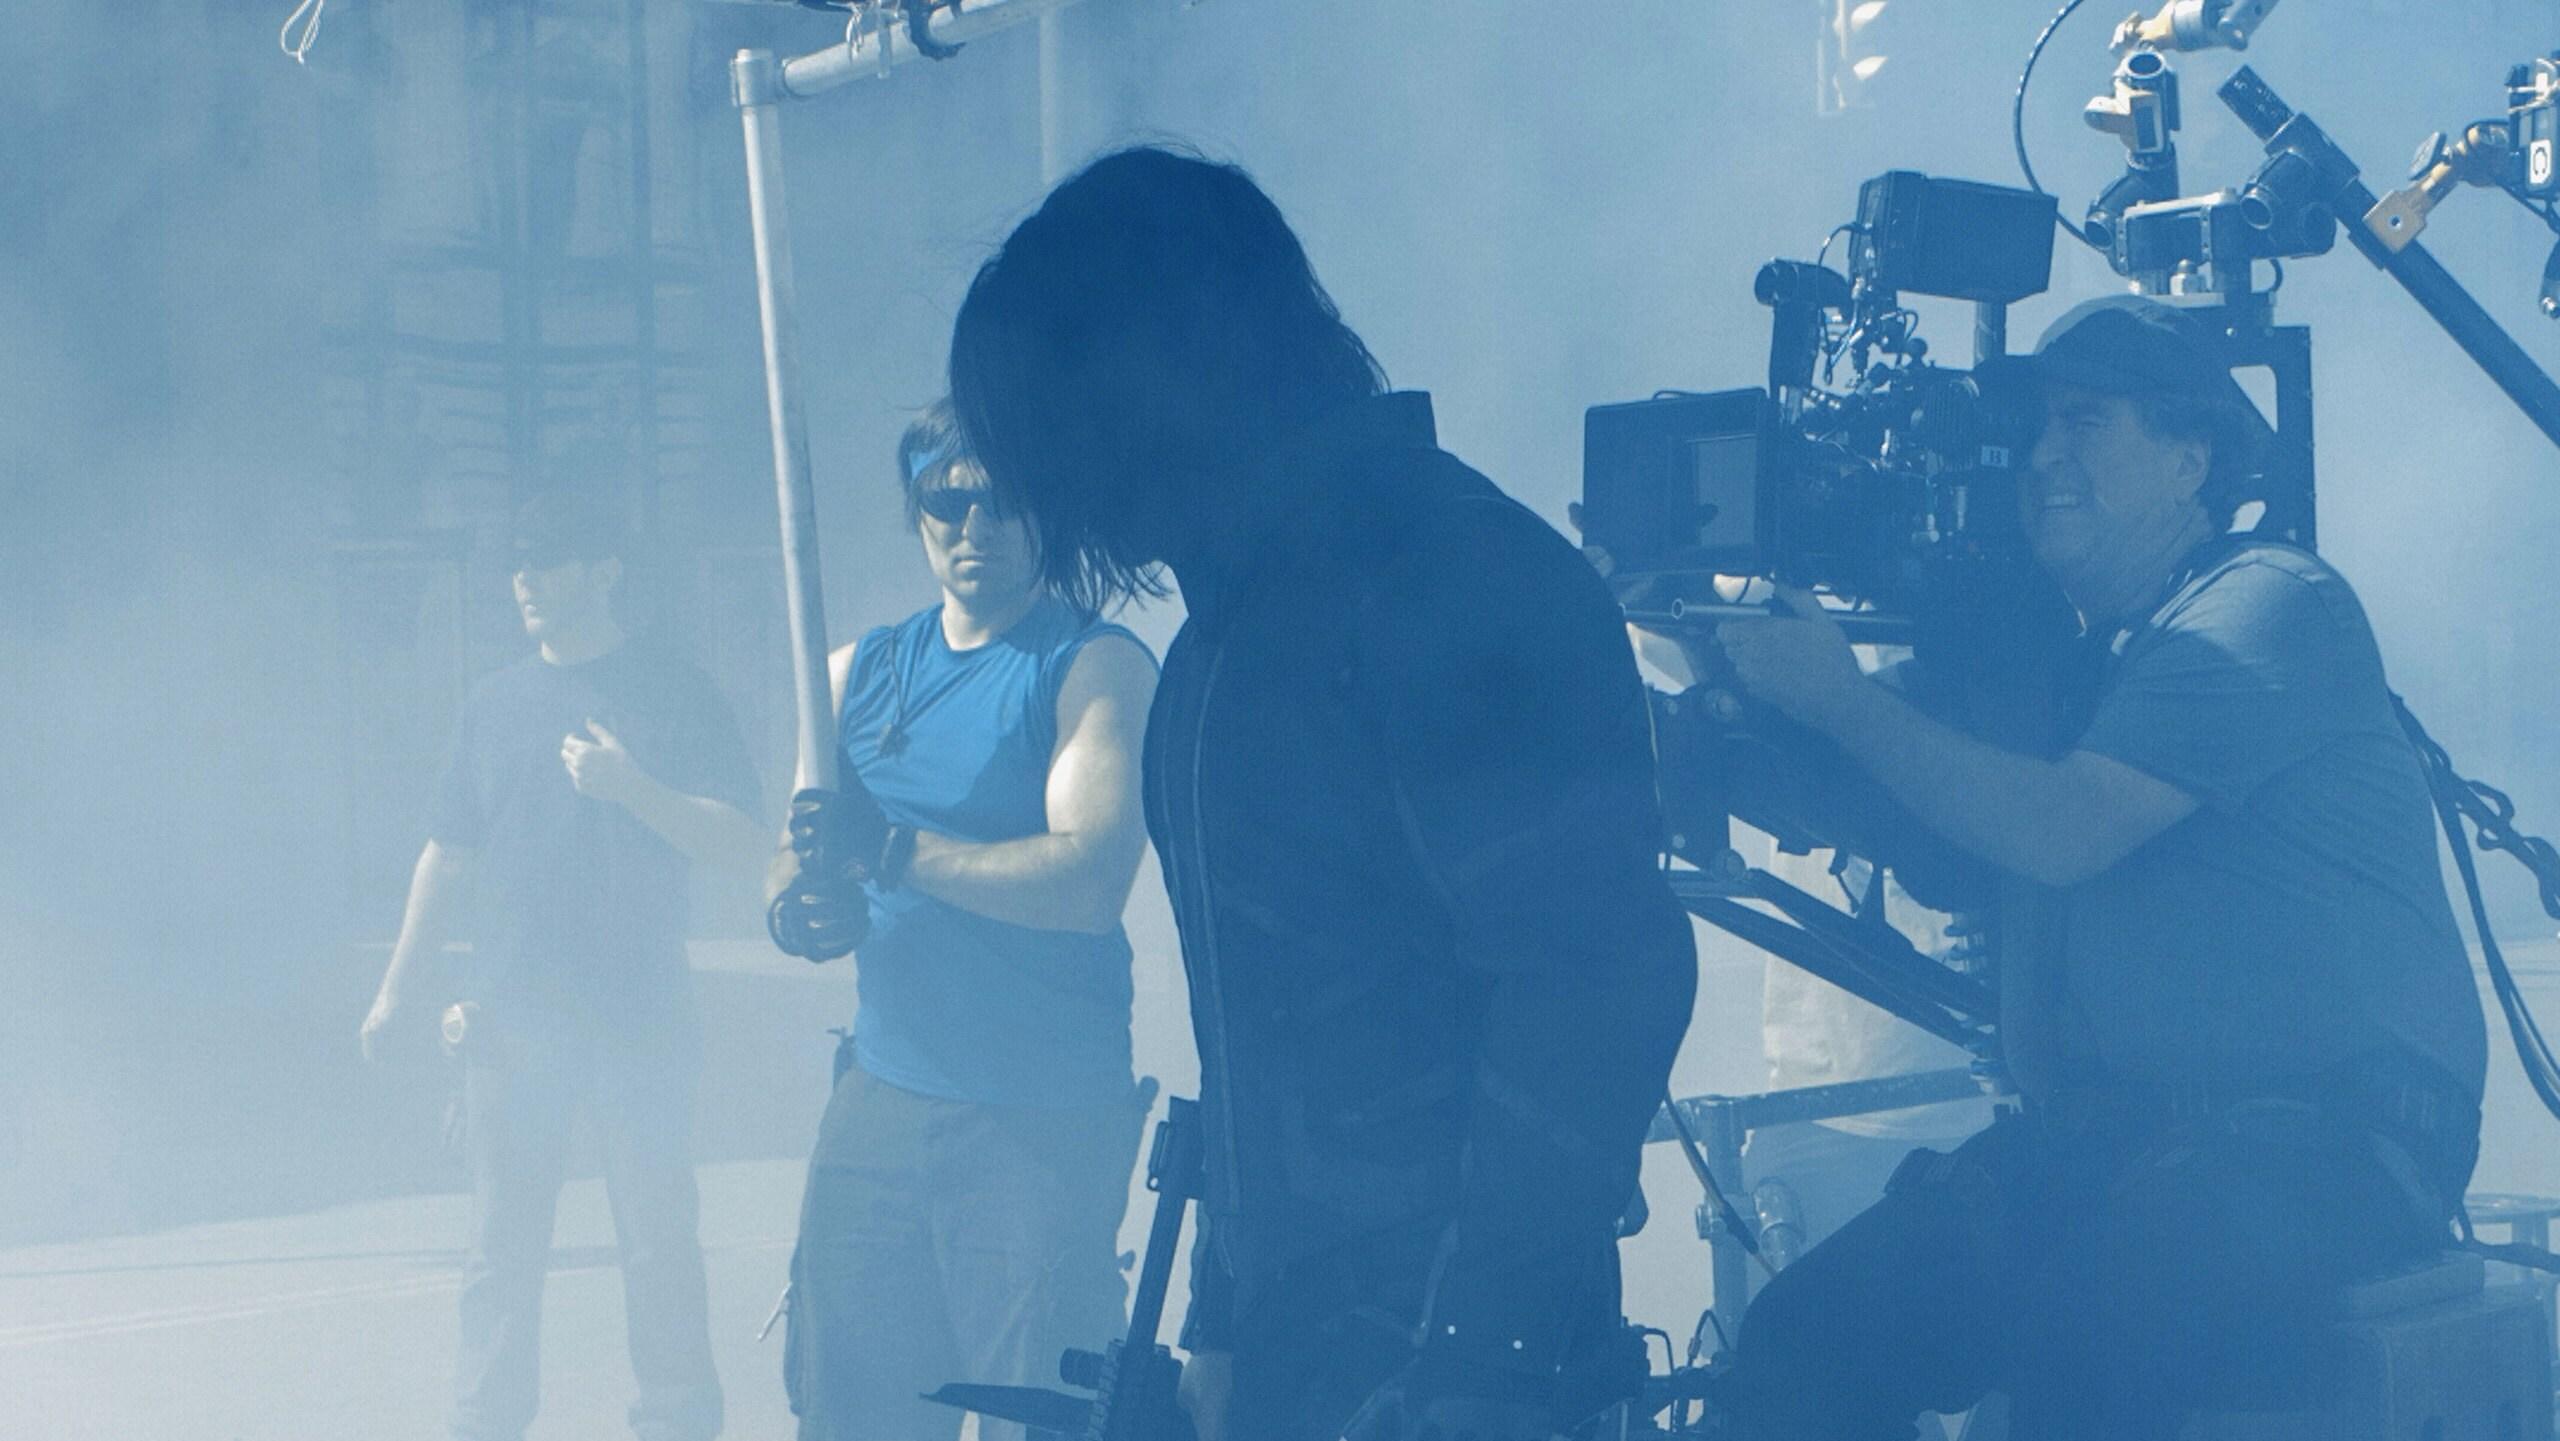 Behind-the-scenes photo of actor Sebastian Stan (Bucky Barnes/Winter Soldier) in Captain America: The Winter Soldier.